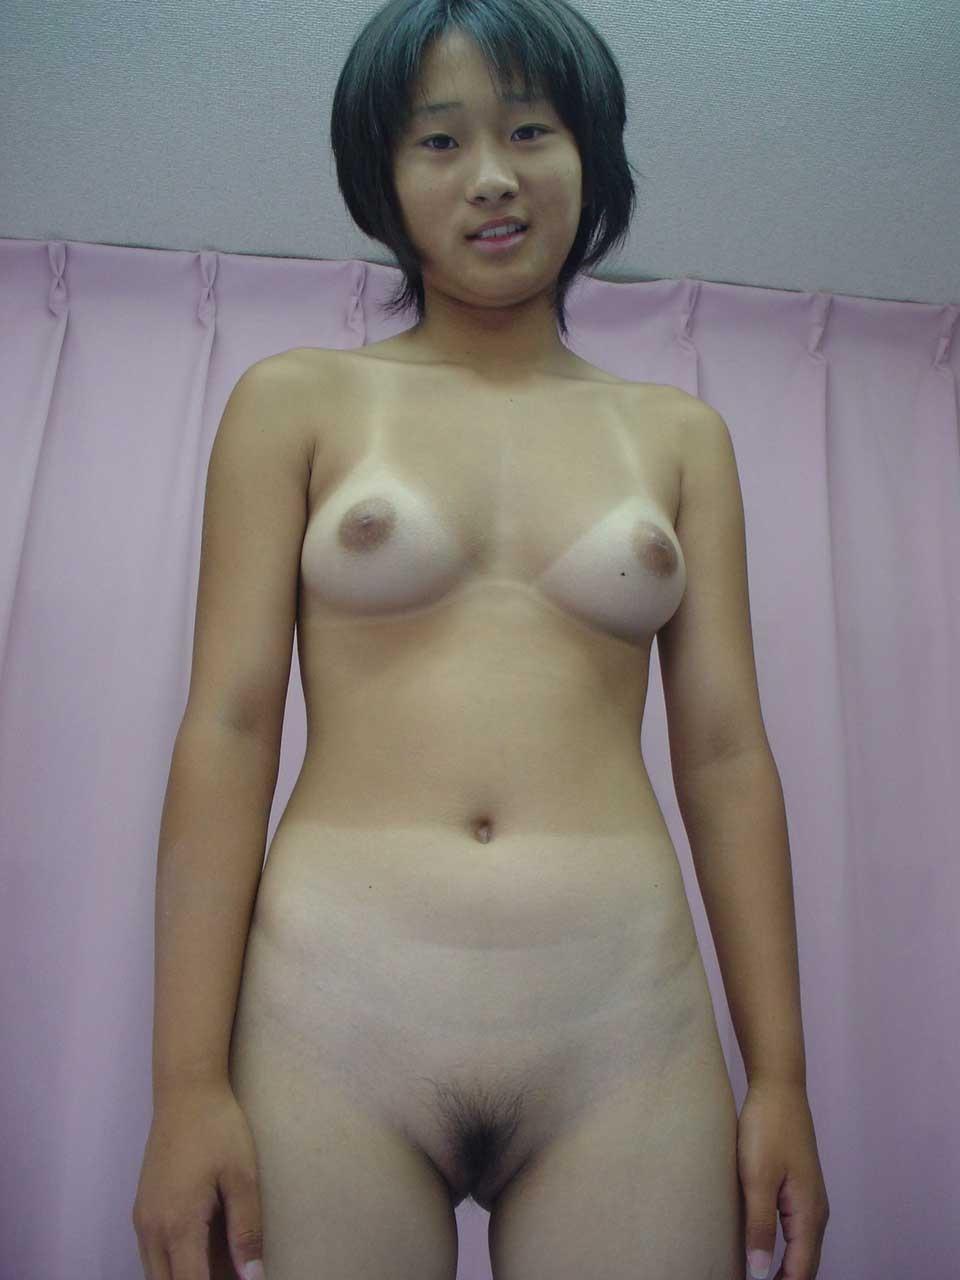 Chubby girl porn pics-1002